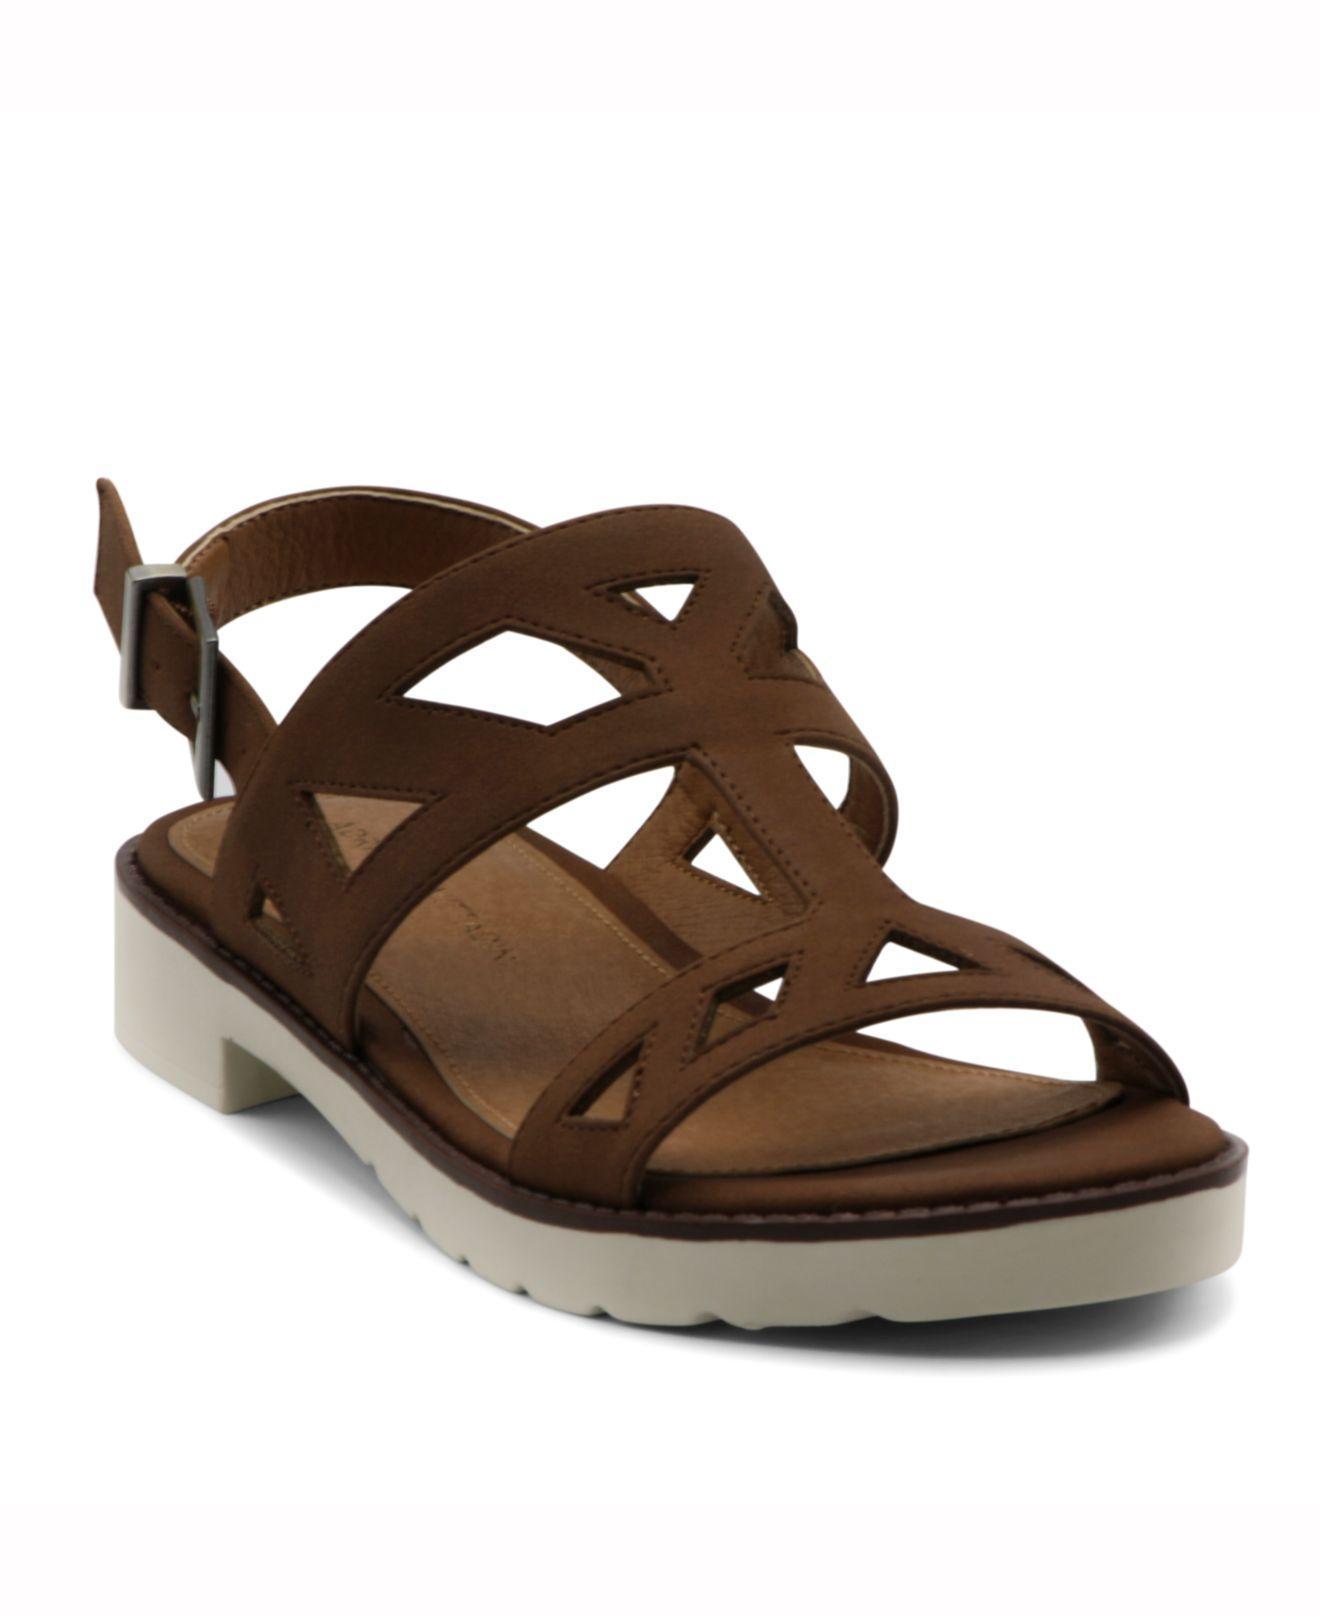 a29ec64c598c Lyst - Adrienne Vittadini Seka Strippy Flat Sandal in Brown